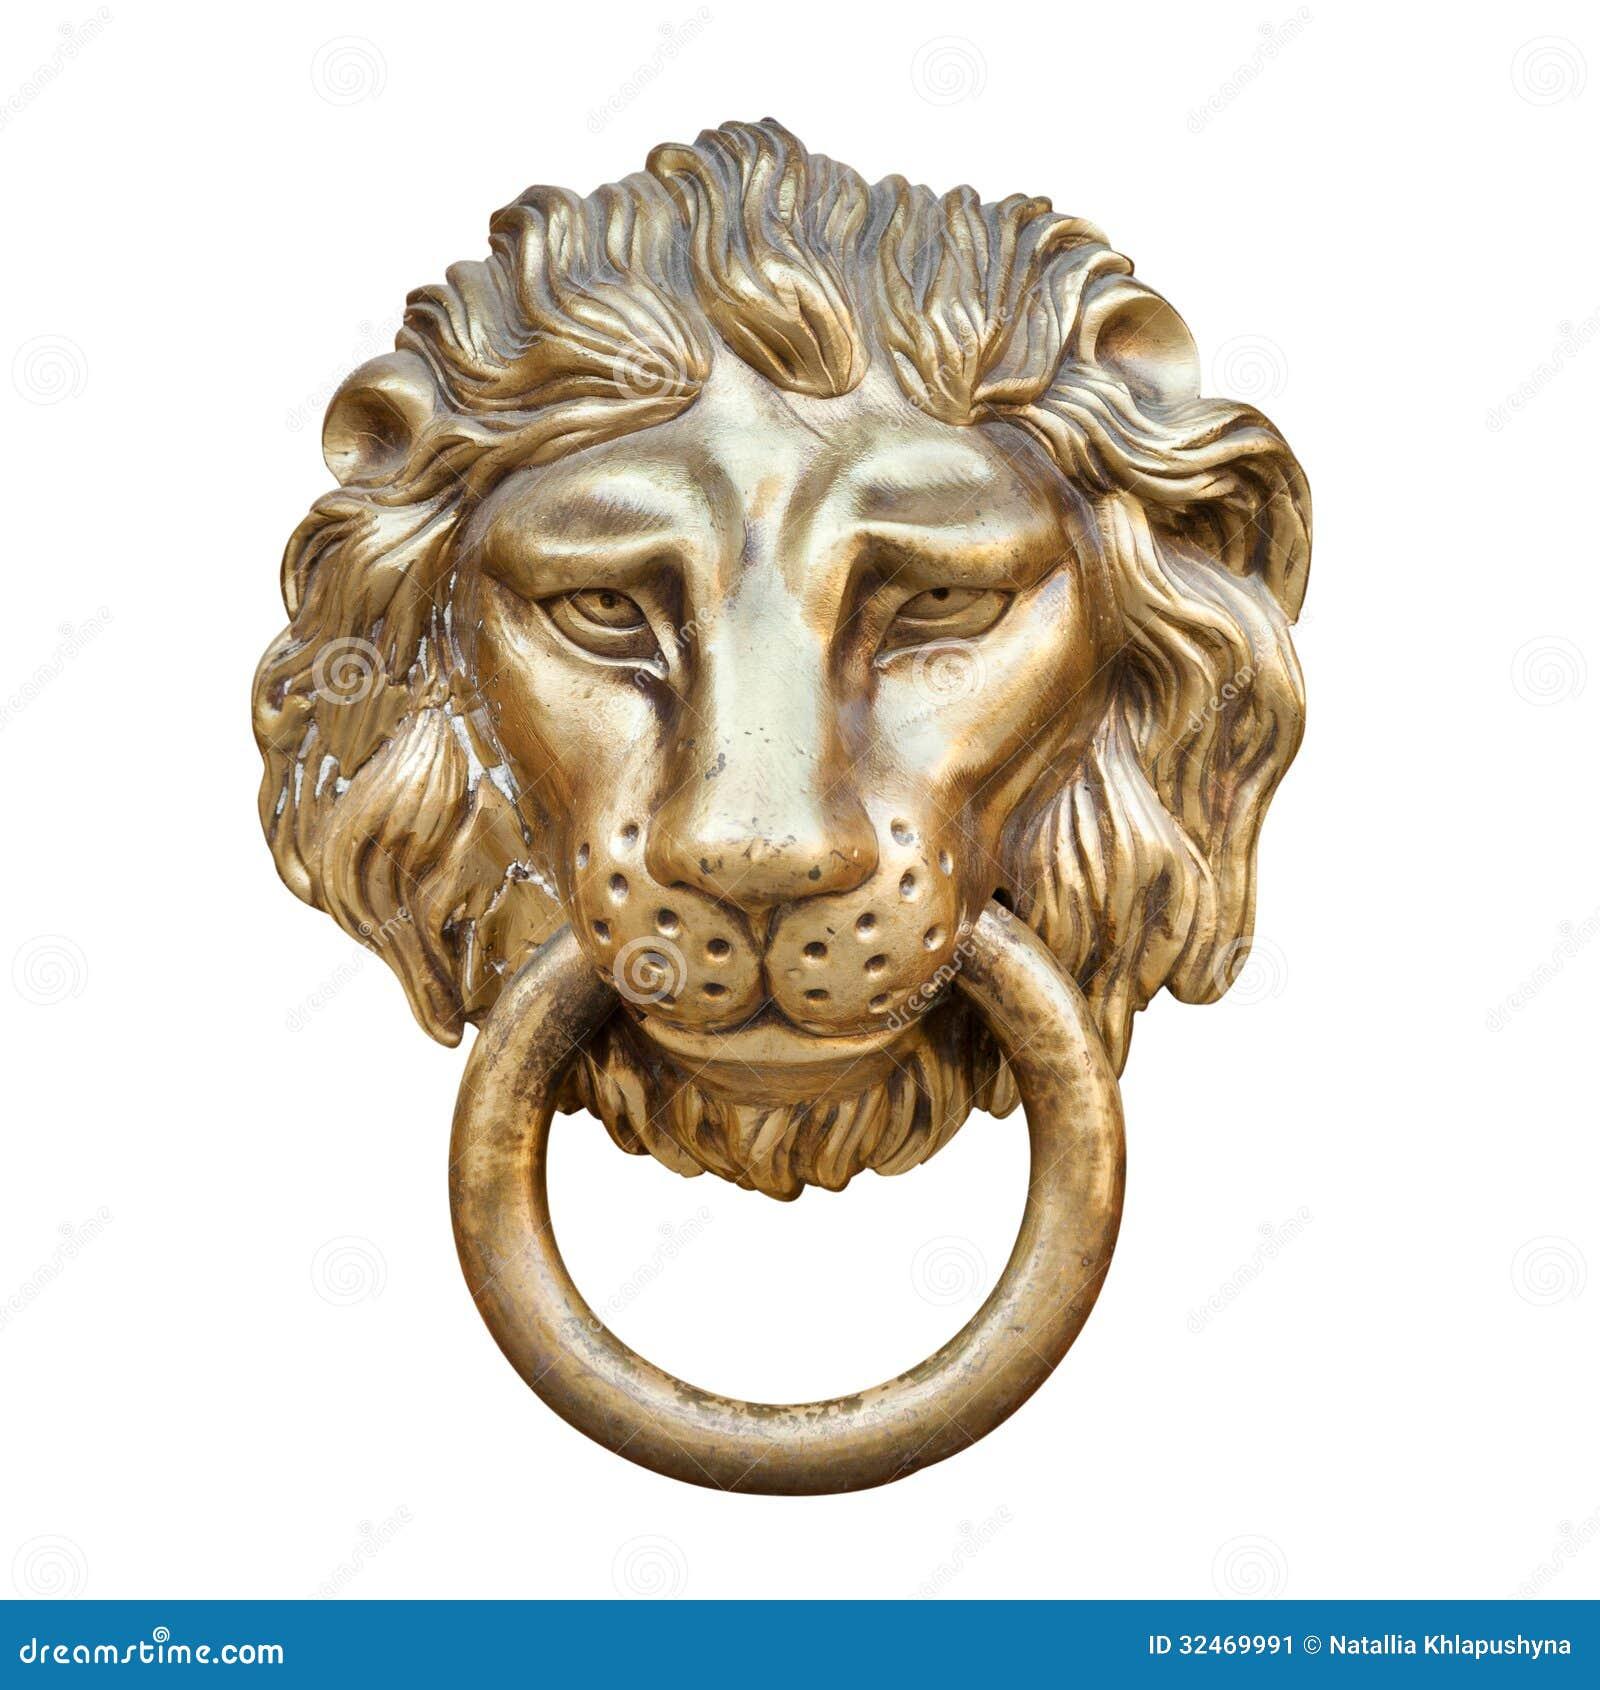 T te de lion heurtoir de porte image stock image 32469991 - Heurtoir de porte tete de lion ...